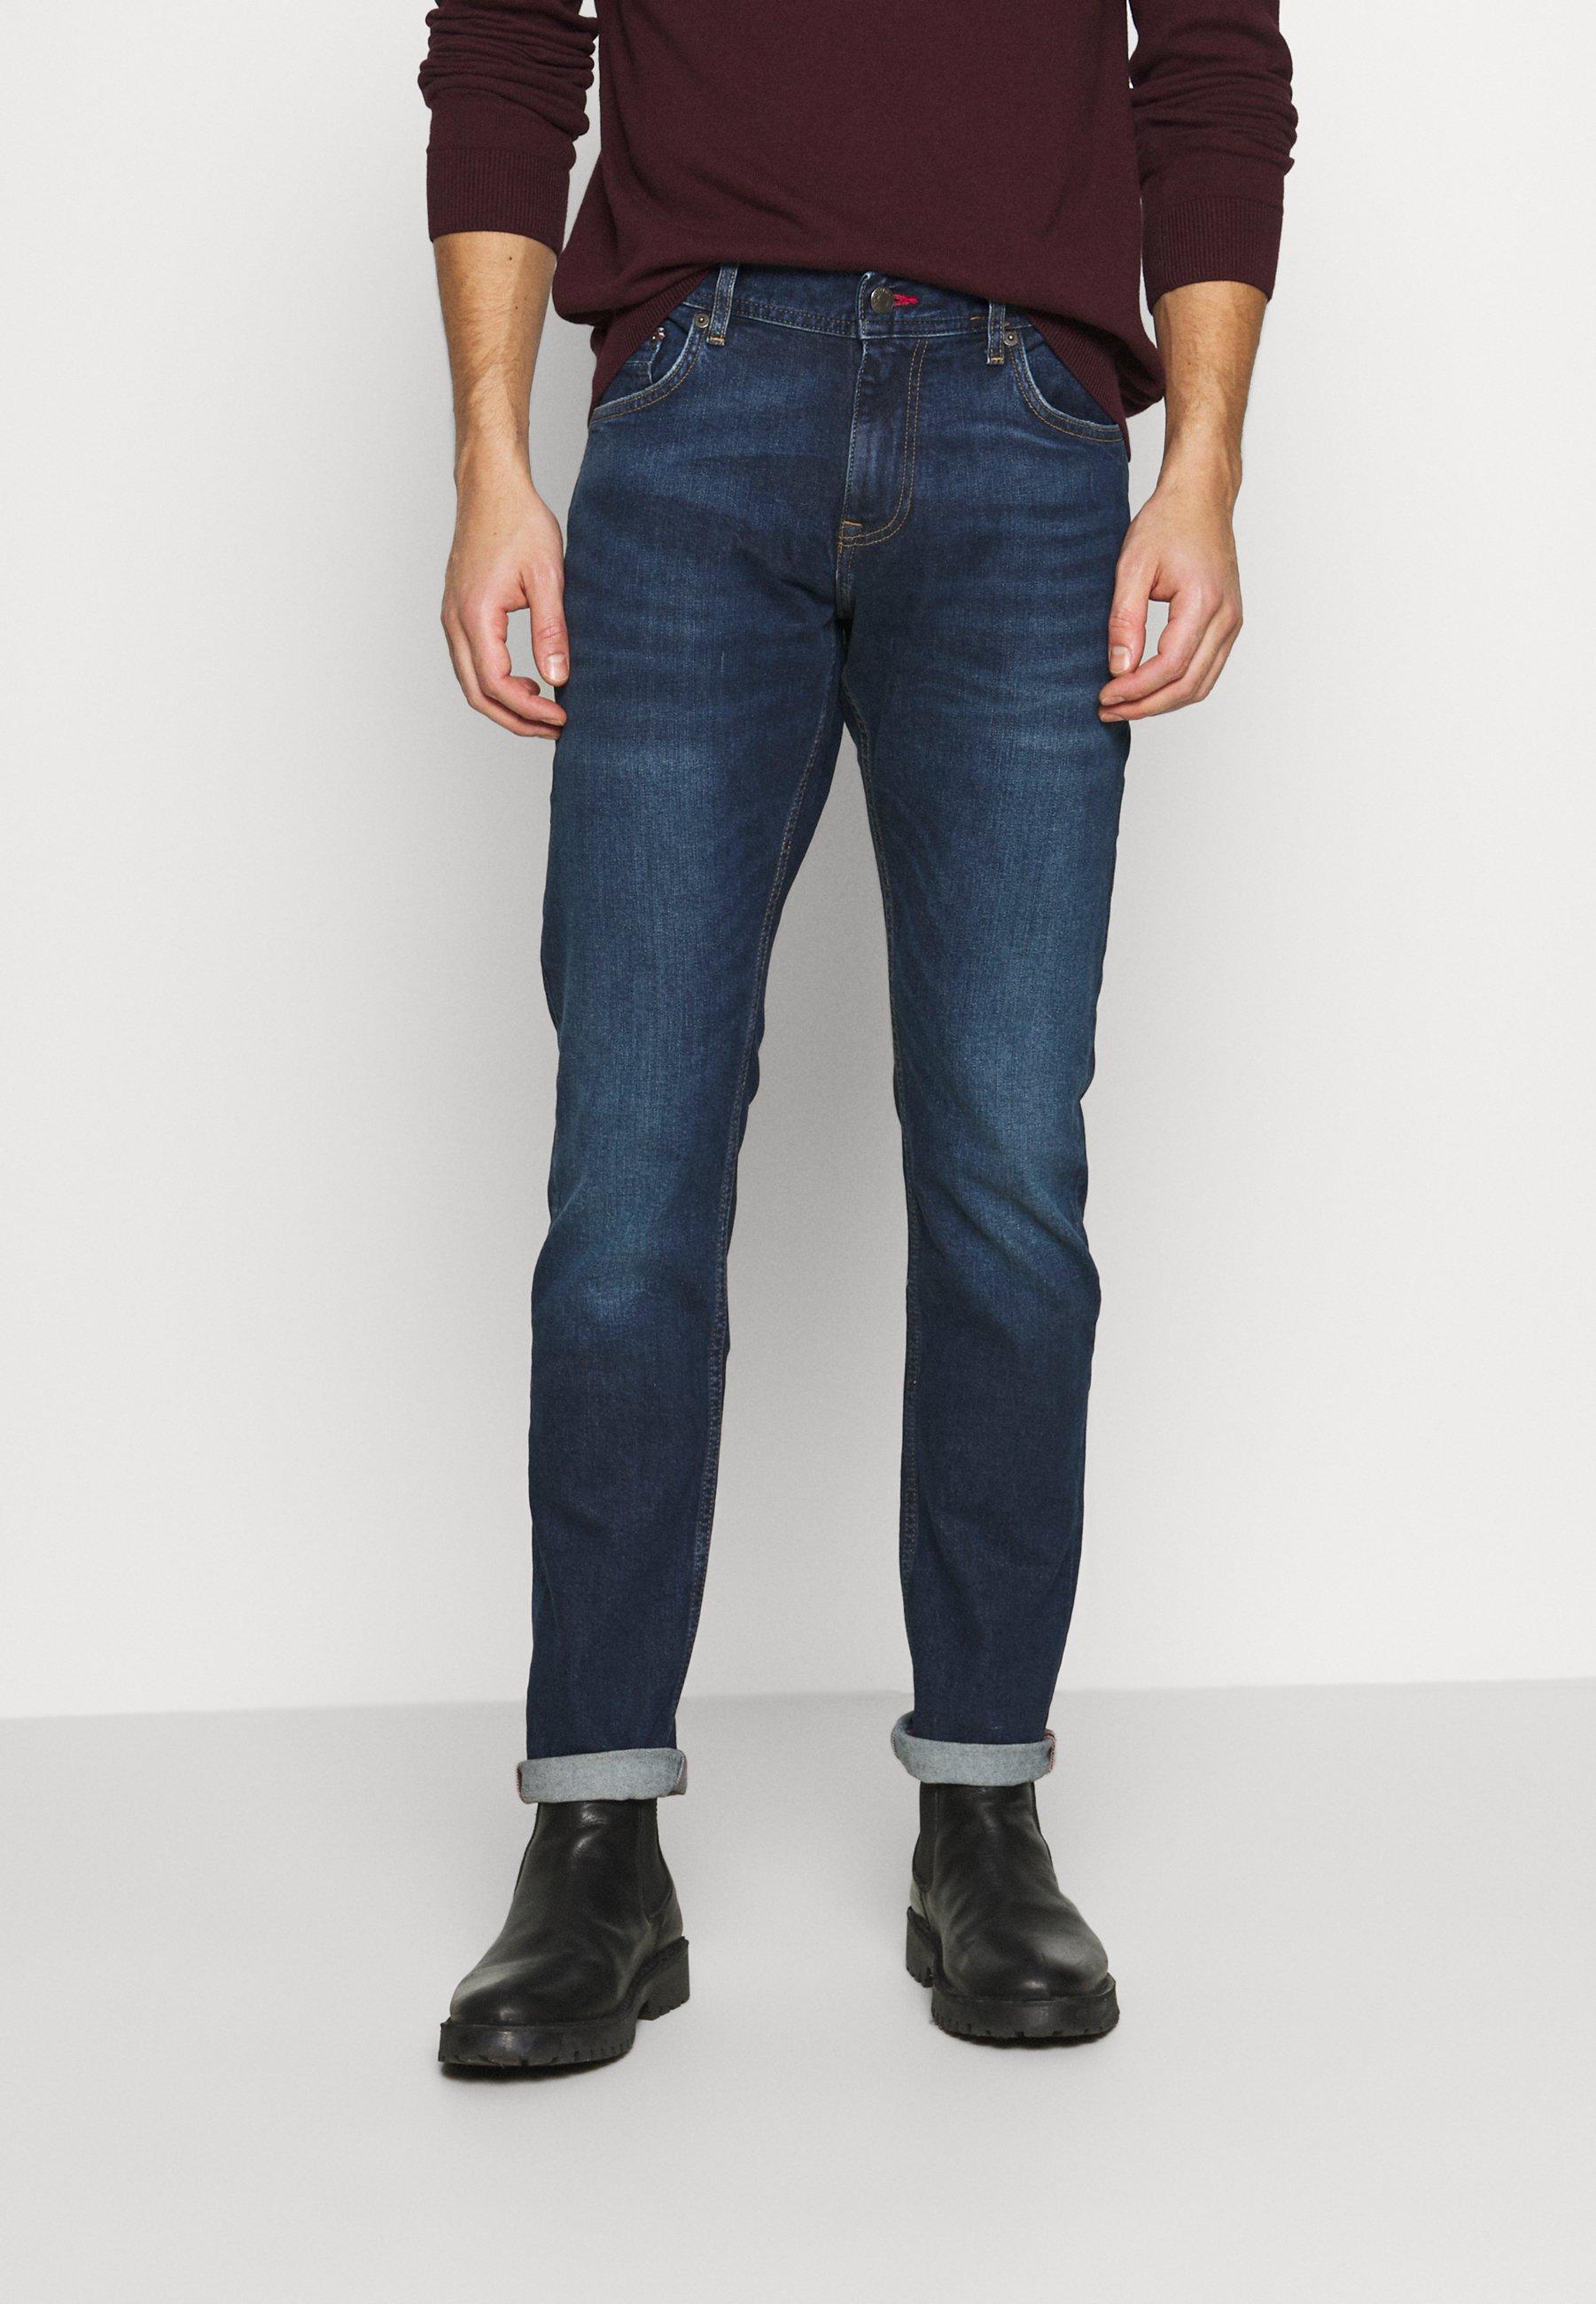 Men SLIM BLEECKER BOWIE BLUE - Slim fit jeans - dark blue